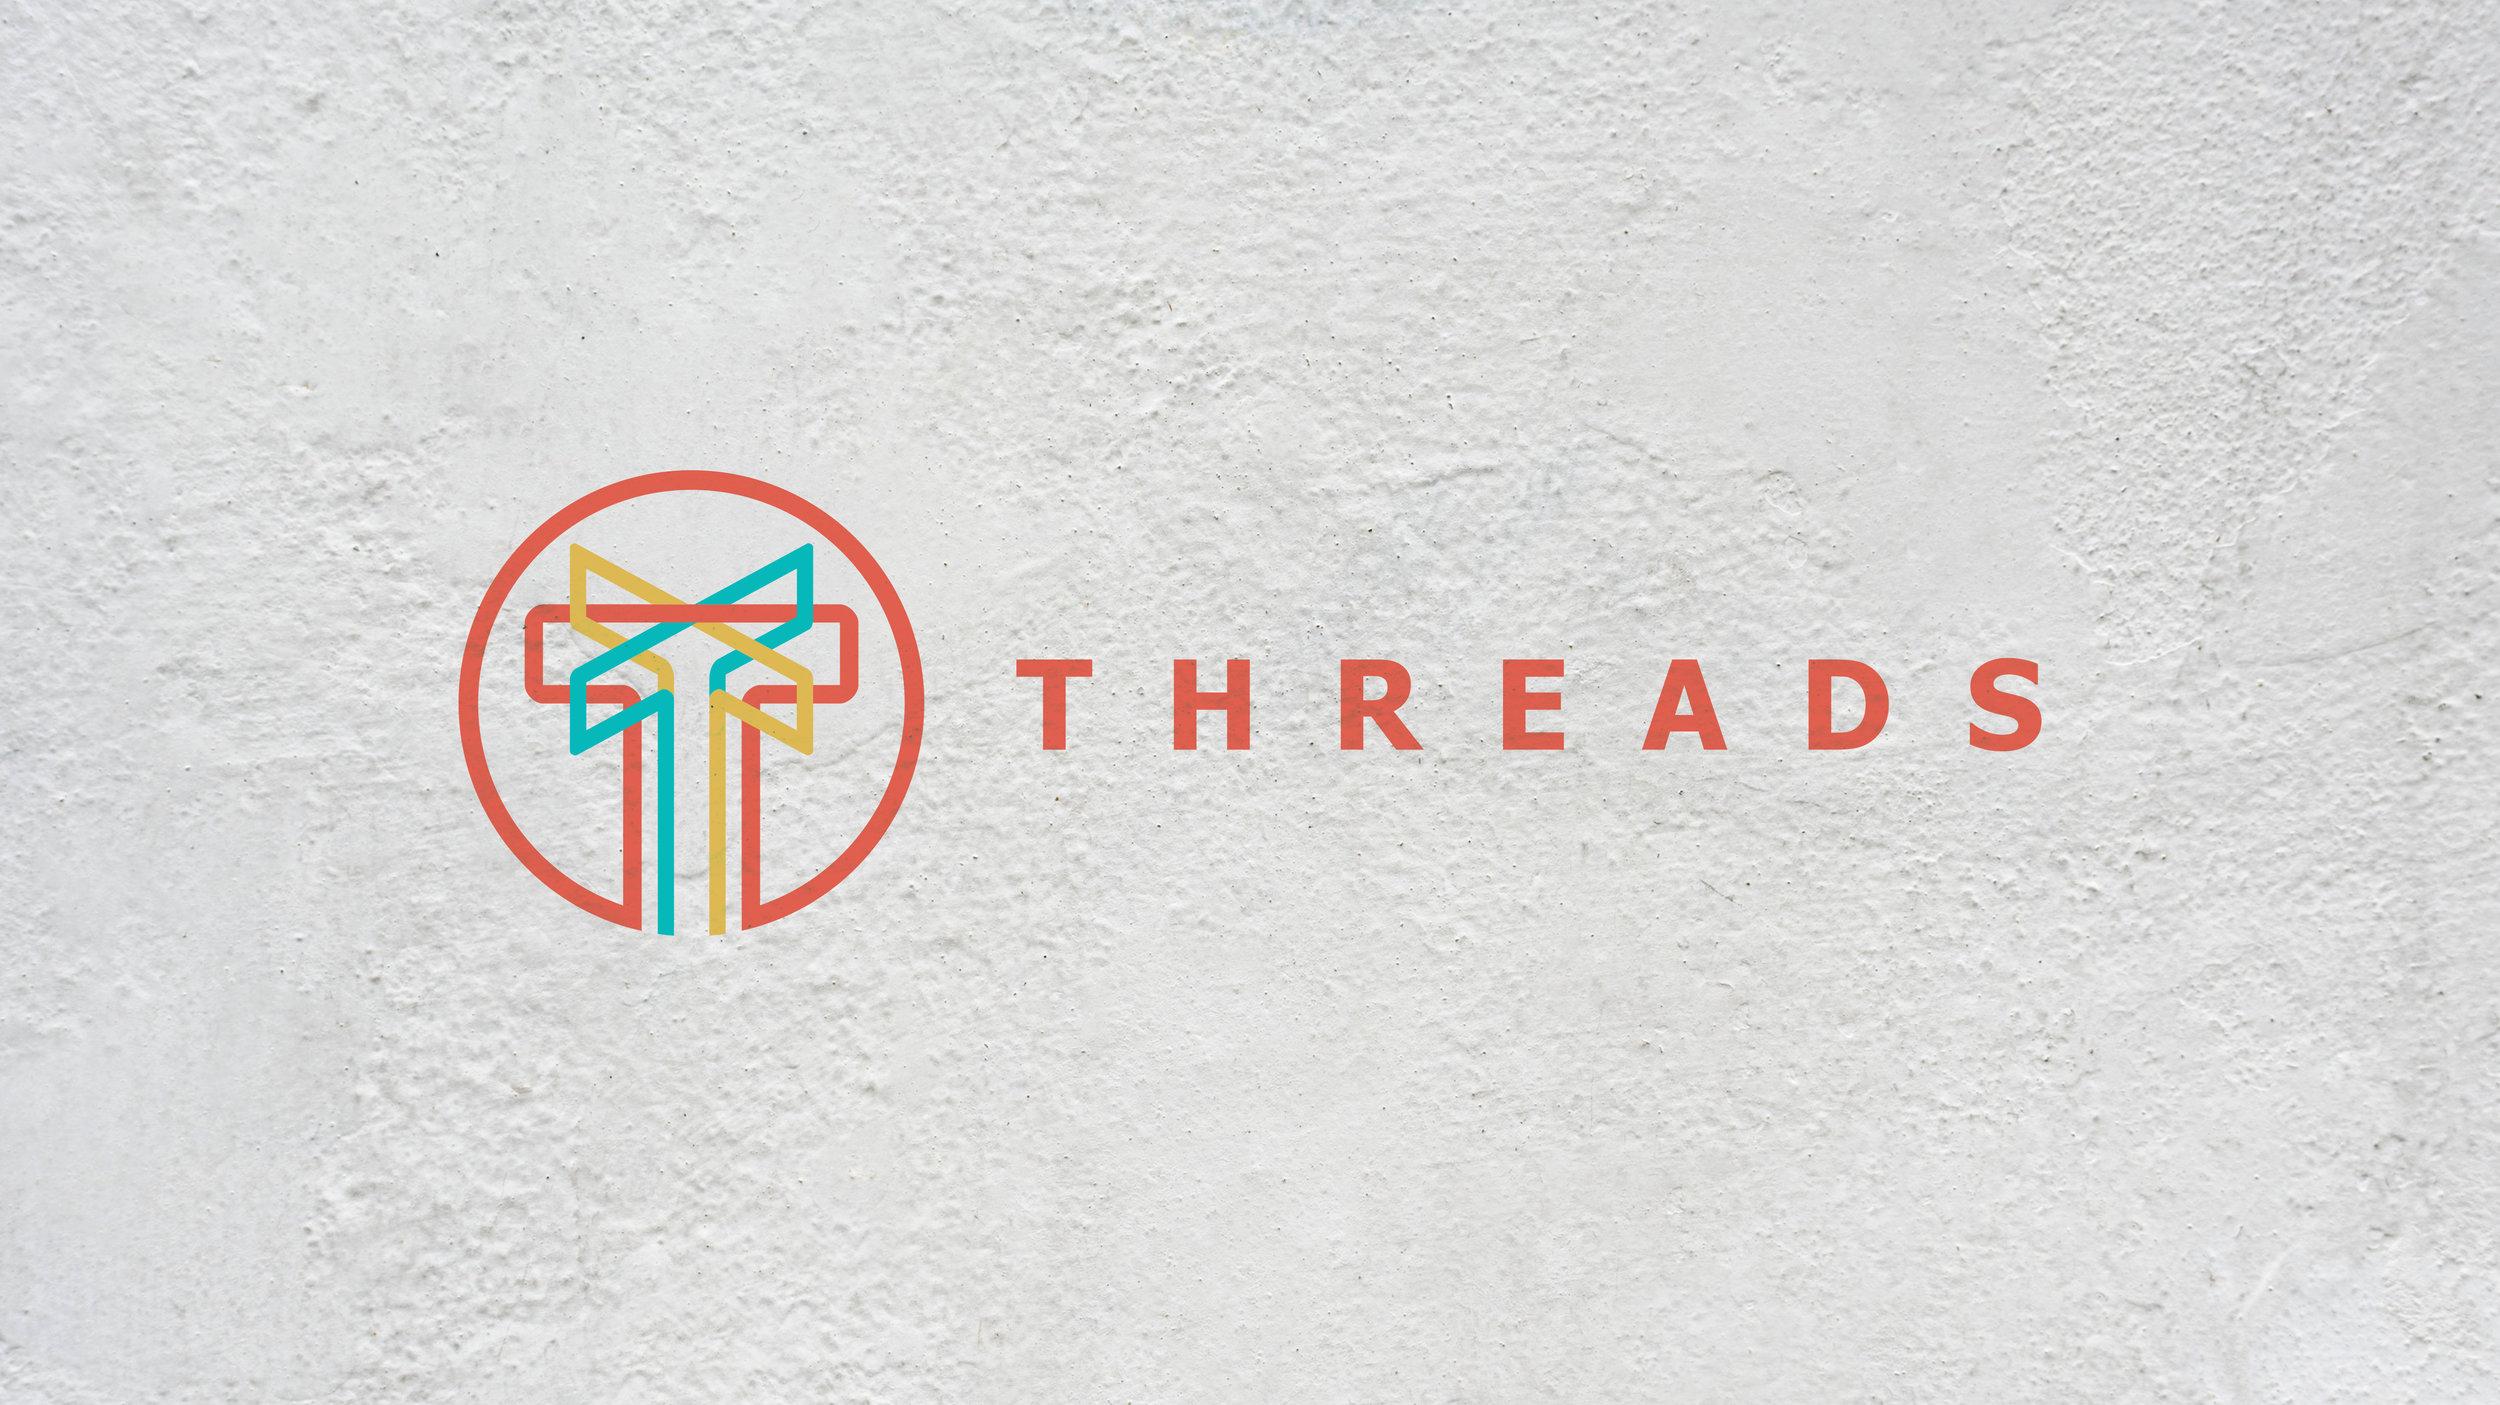 Threads-Banner-01.jpg